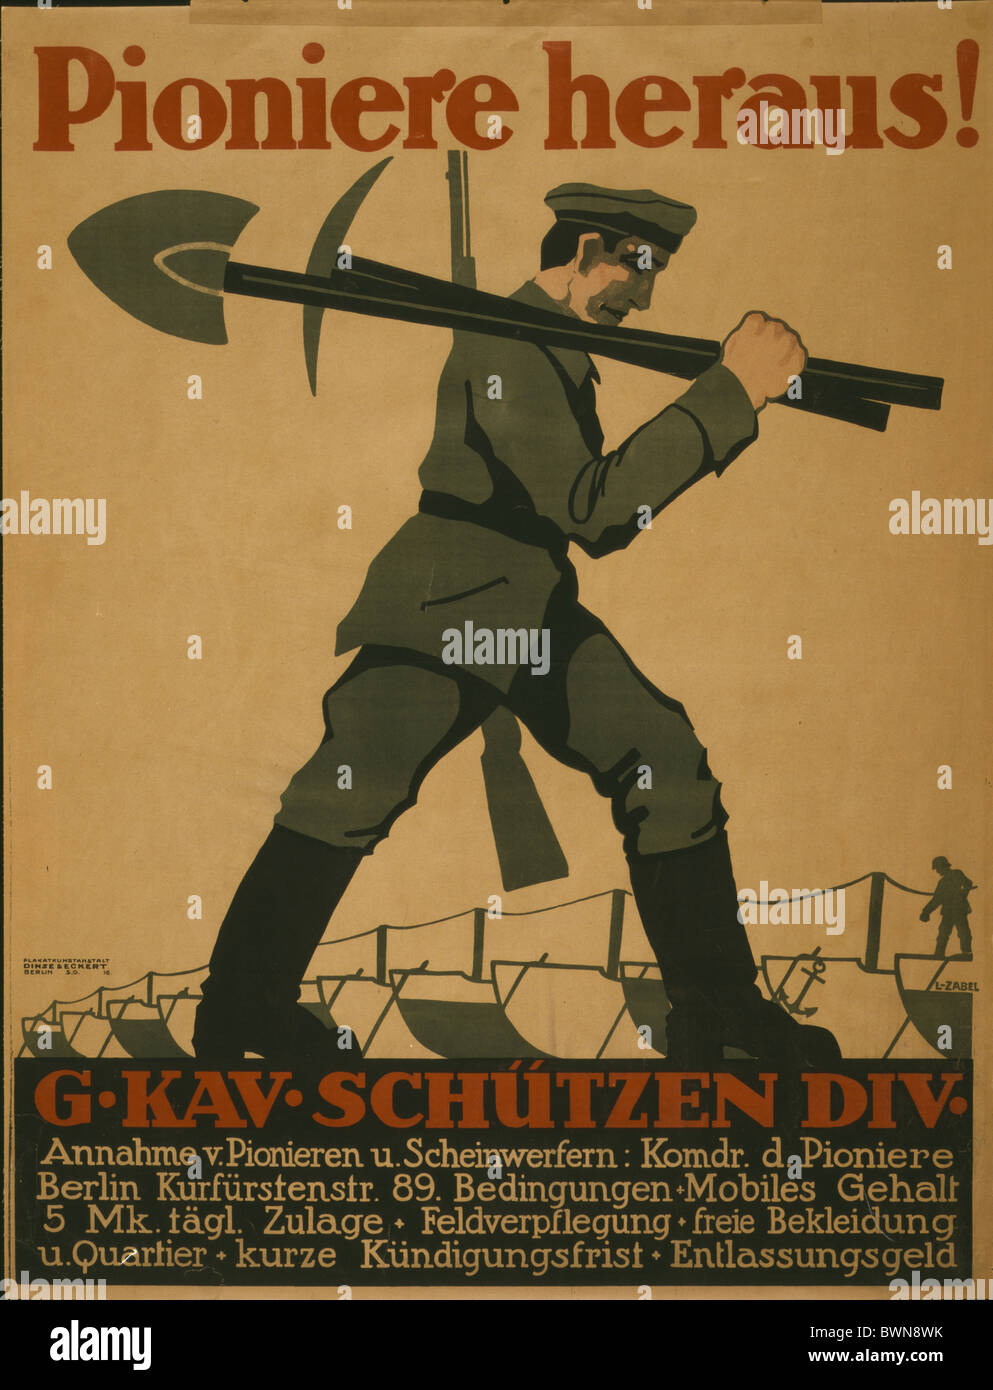 1918 Poster soldier fusil pickax pelle histoire de Berlin historique historique allemand de propagande Empi Photo Stock